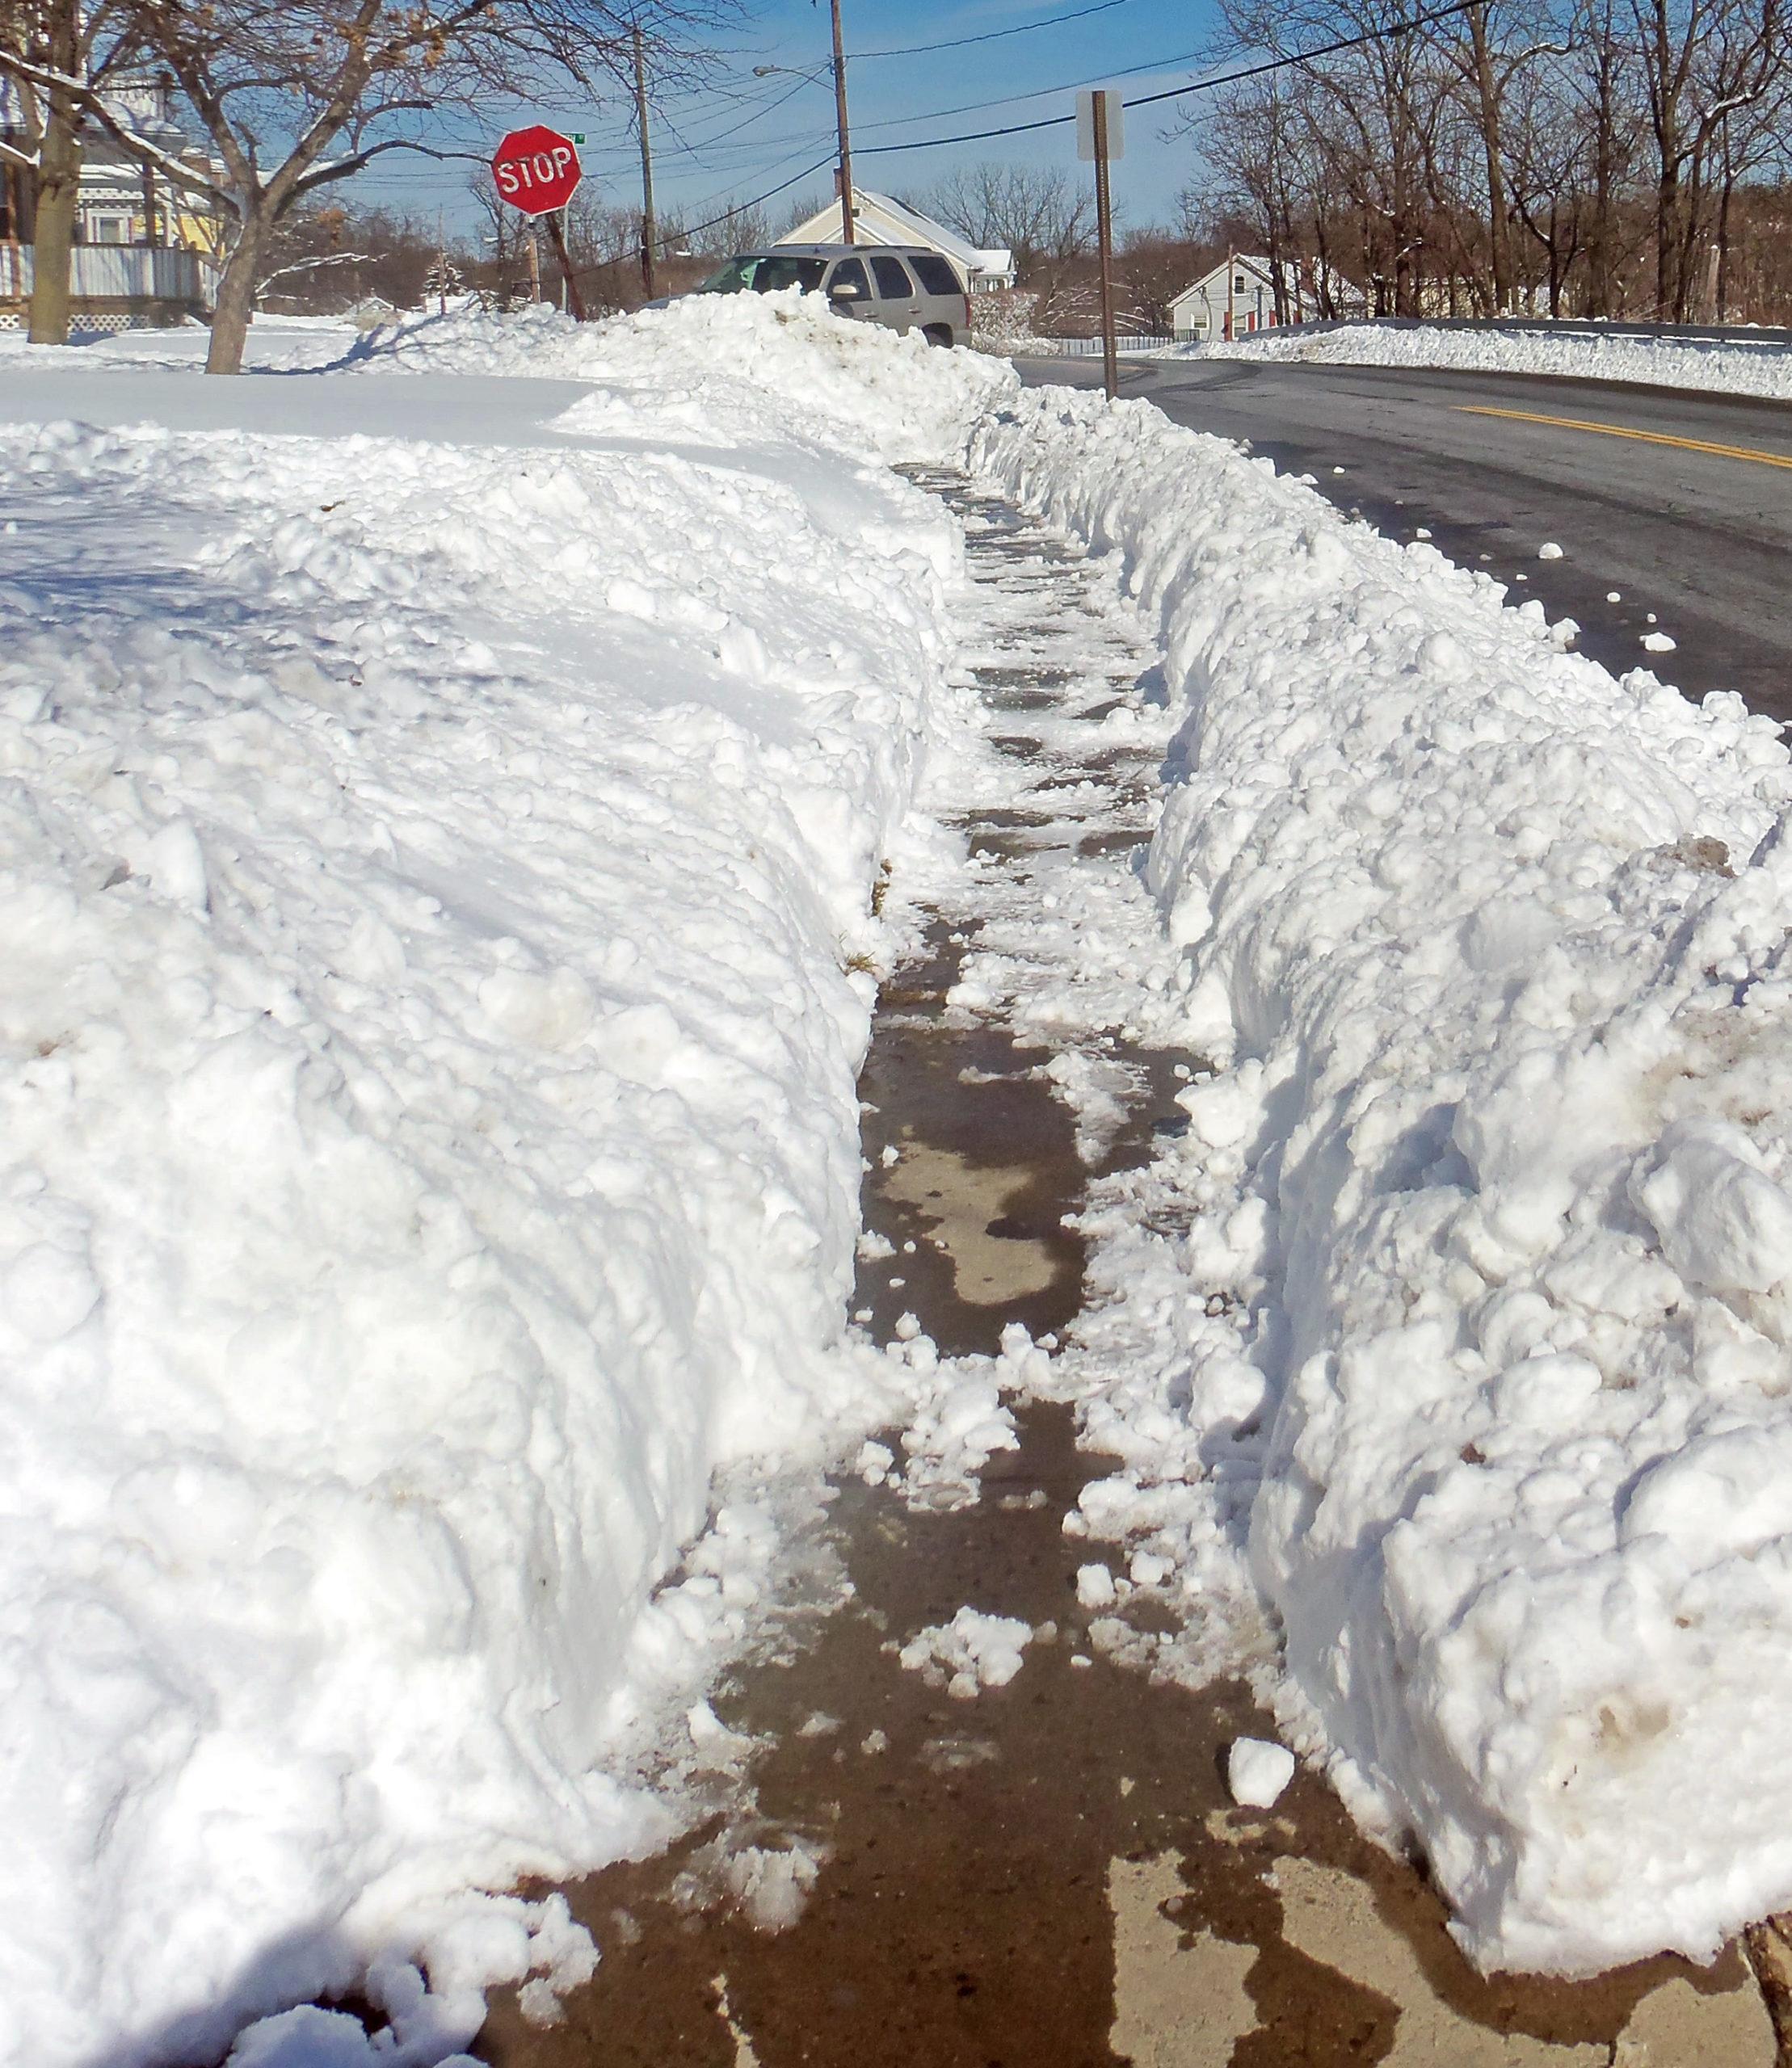 Philadephia snow removal code